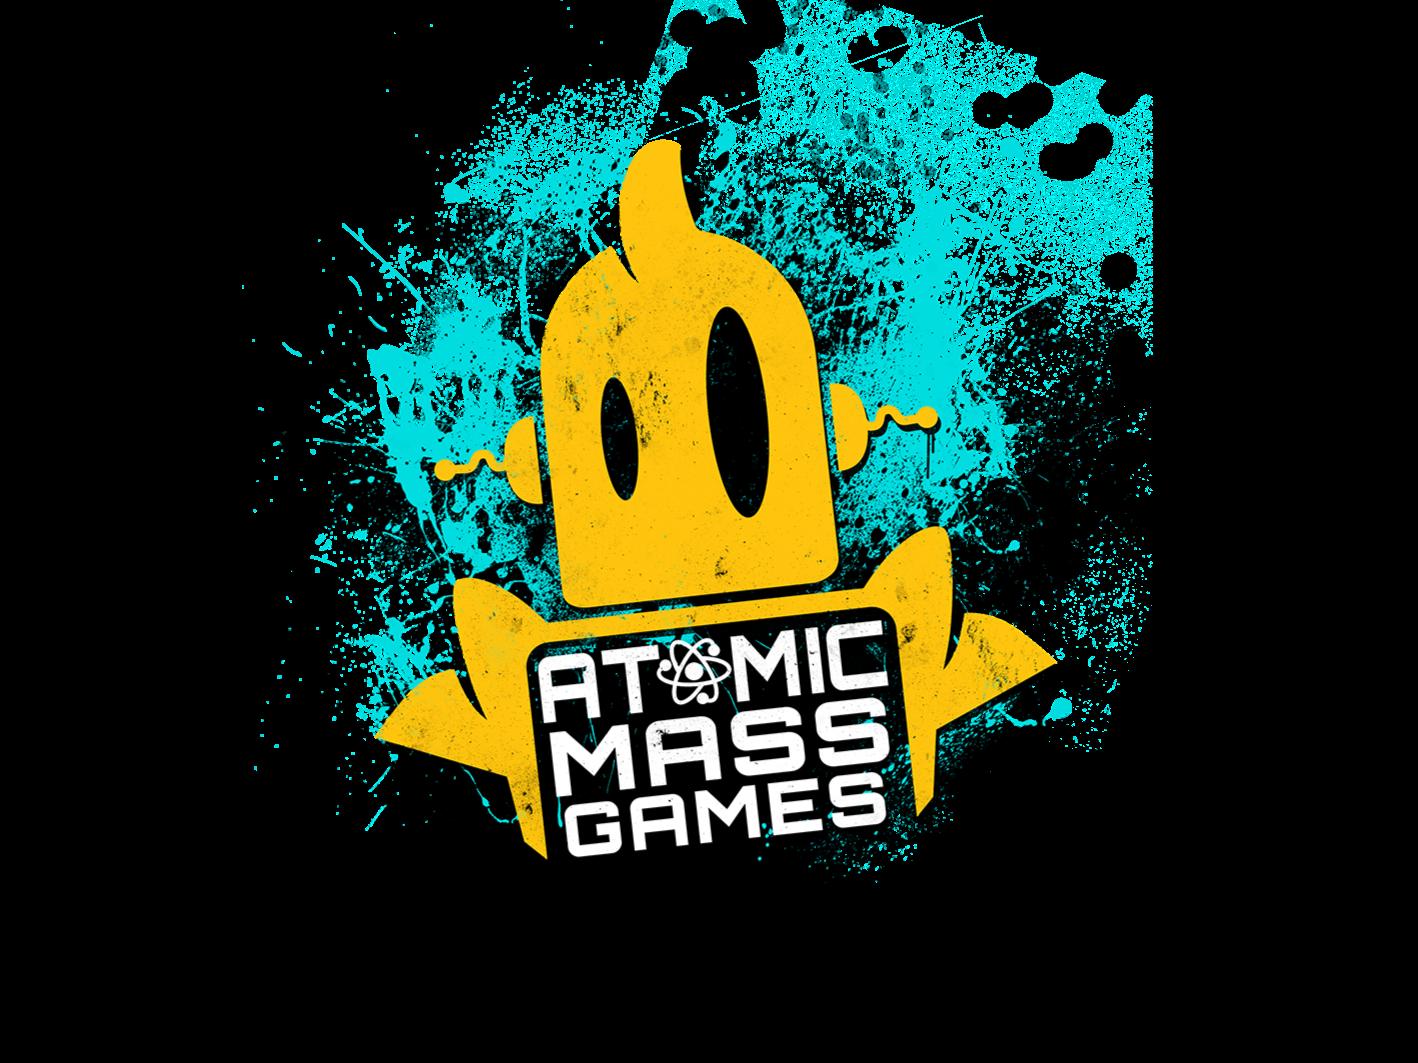 atomicmass-logo_edited.png